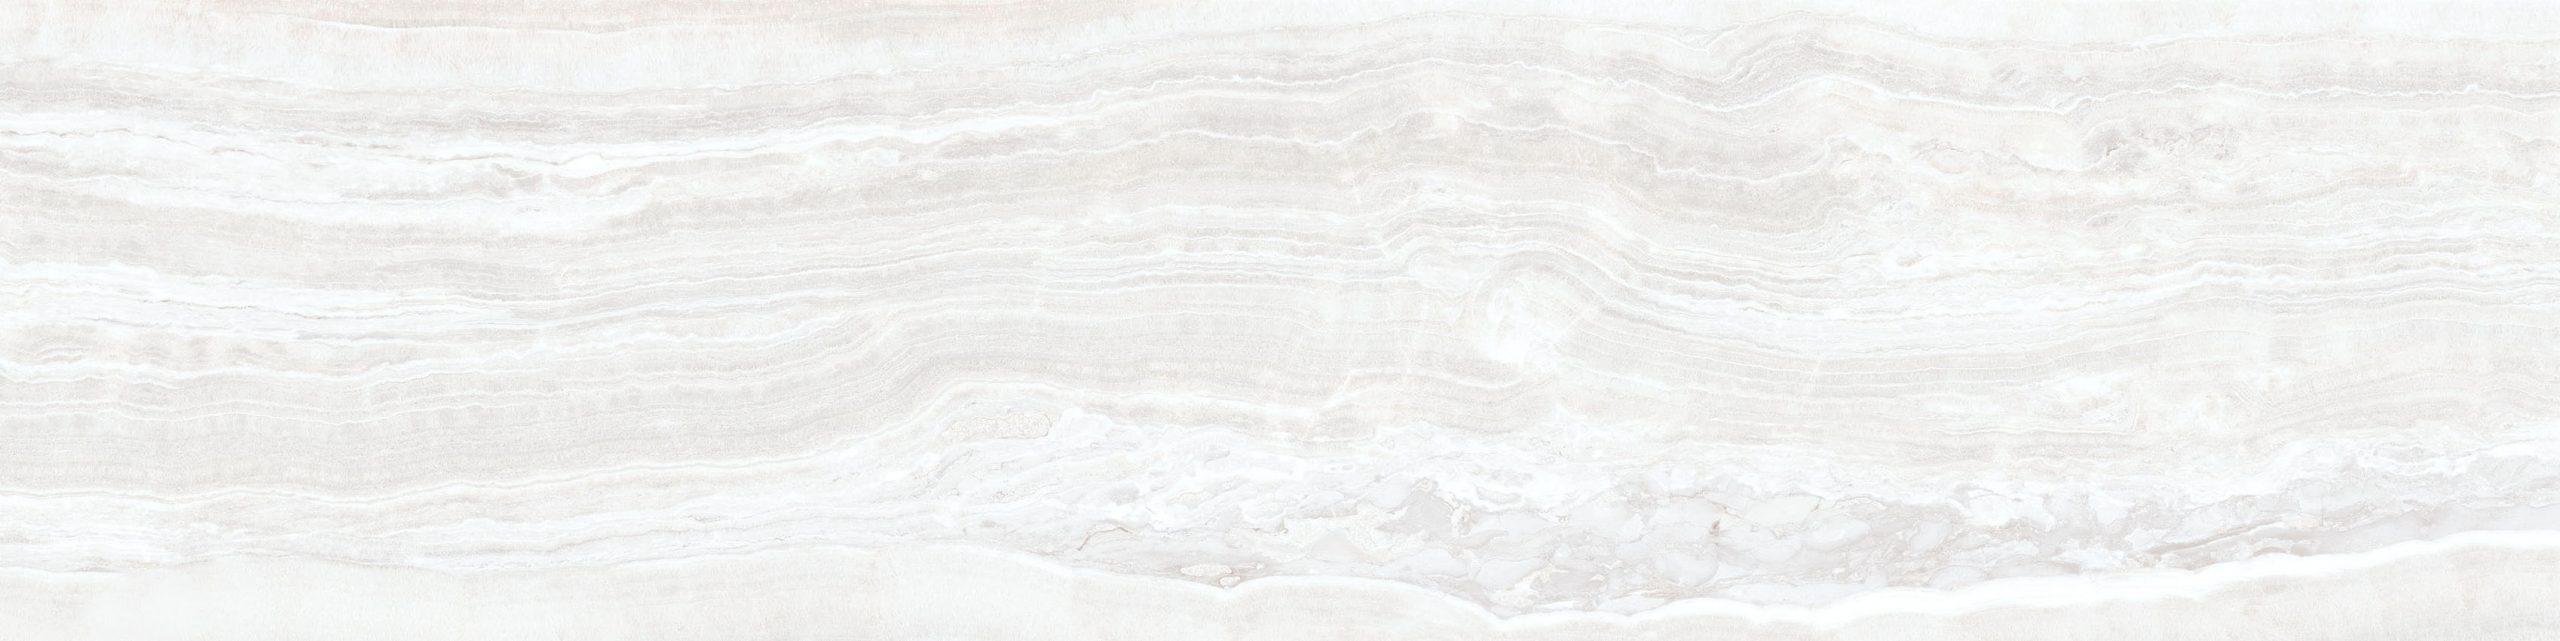 Onyx of Cerim White Matte 10mm 30 x 120